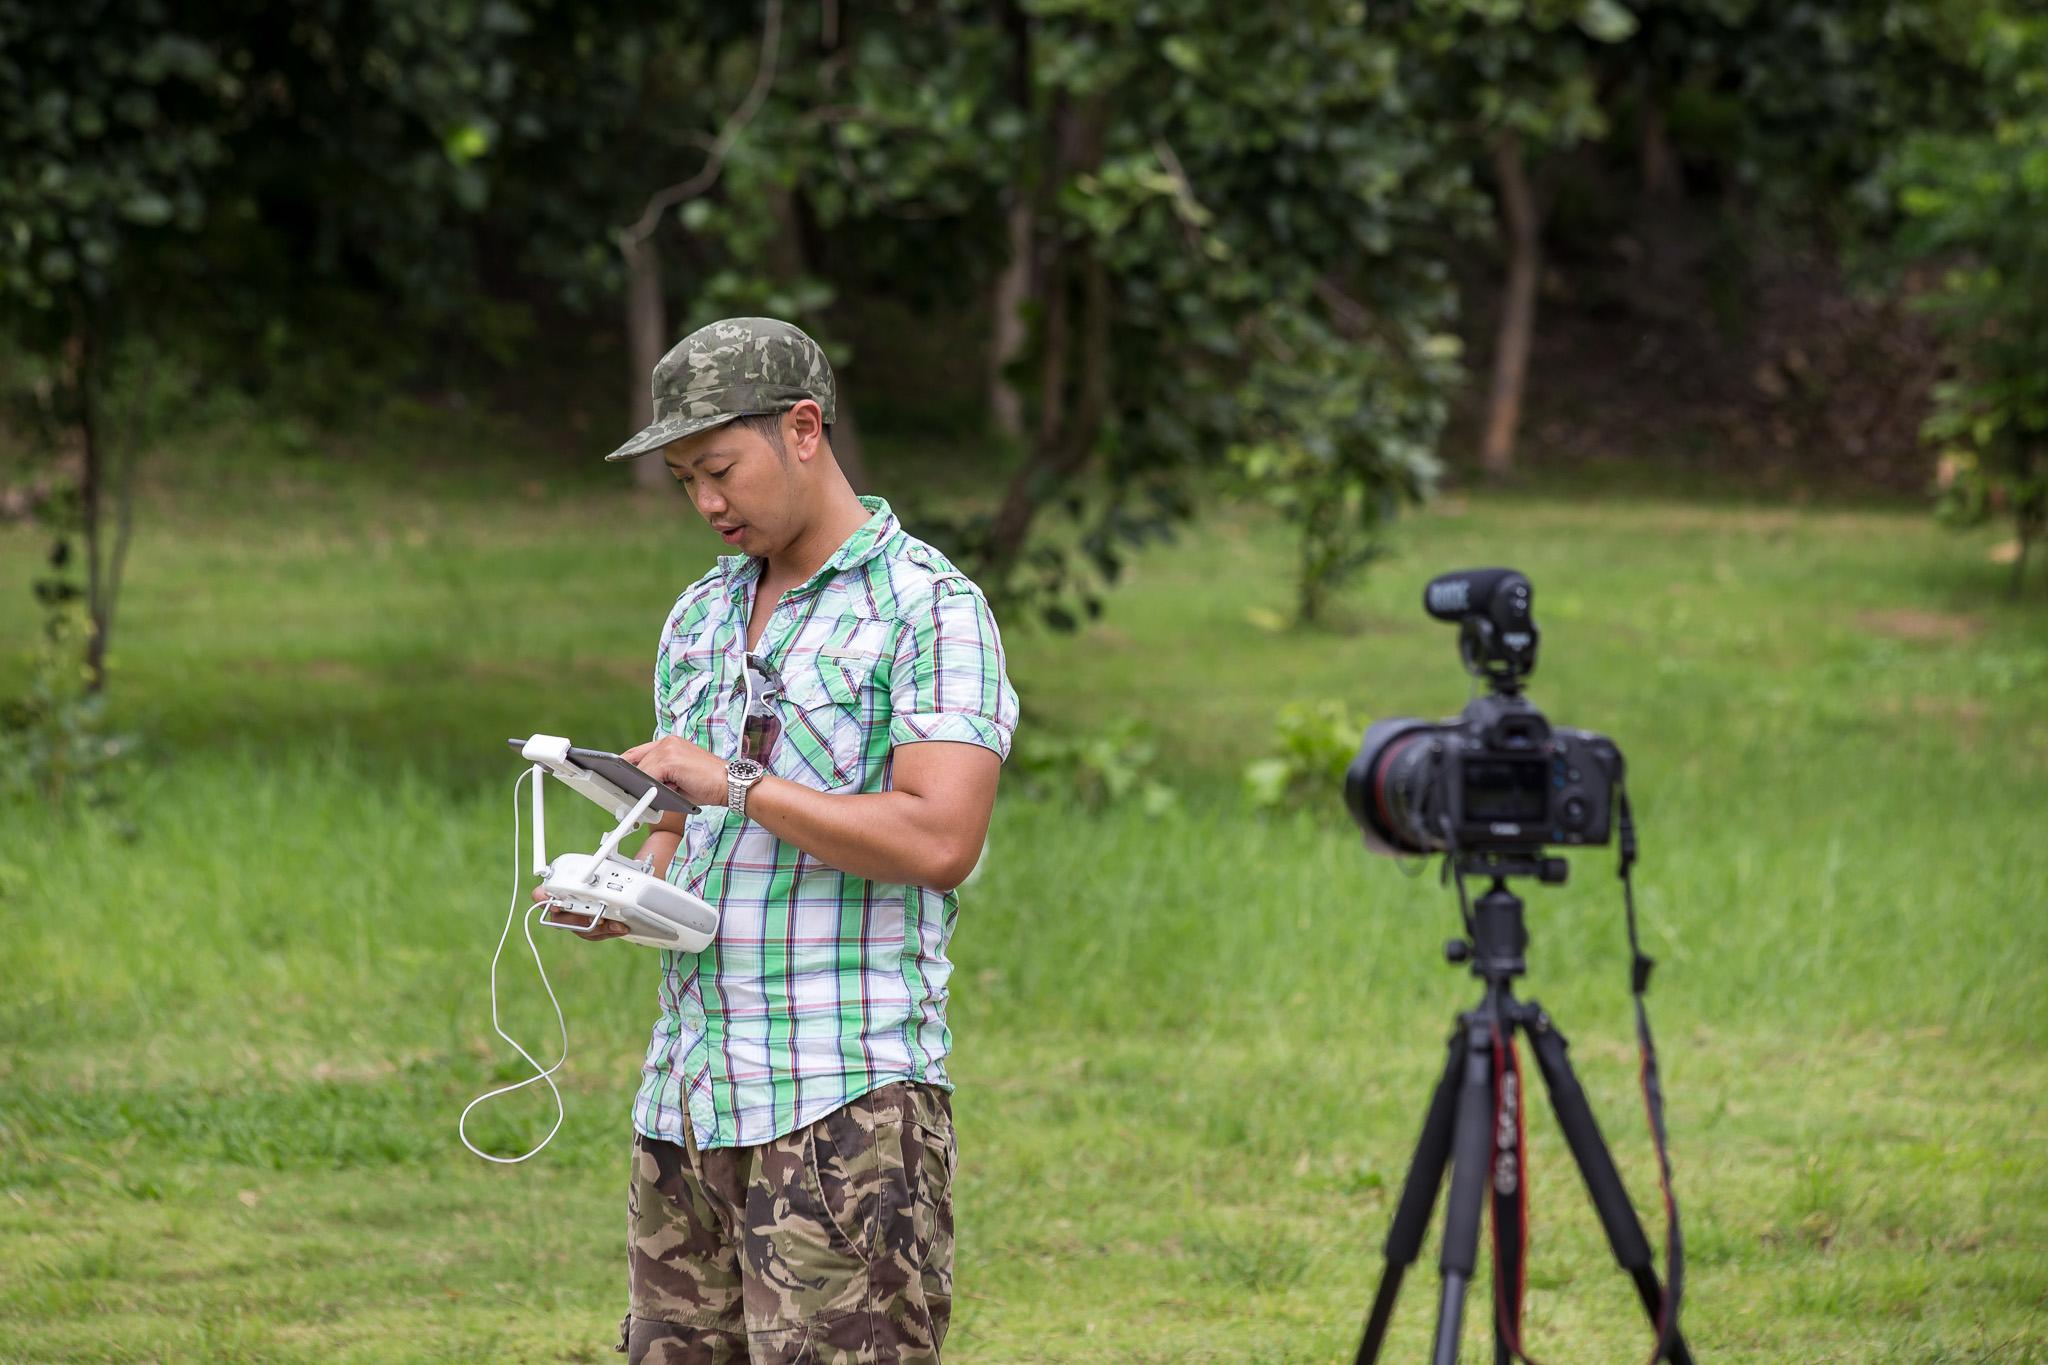 Thialand videographer